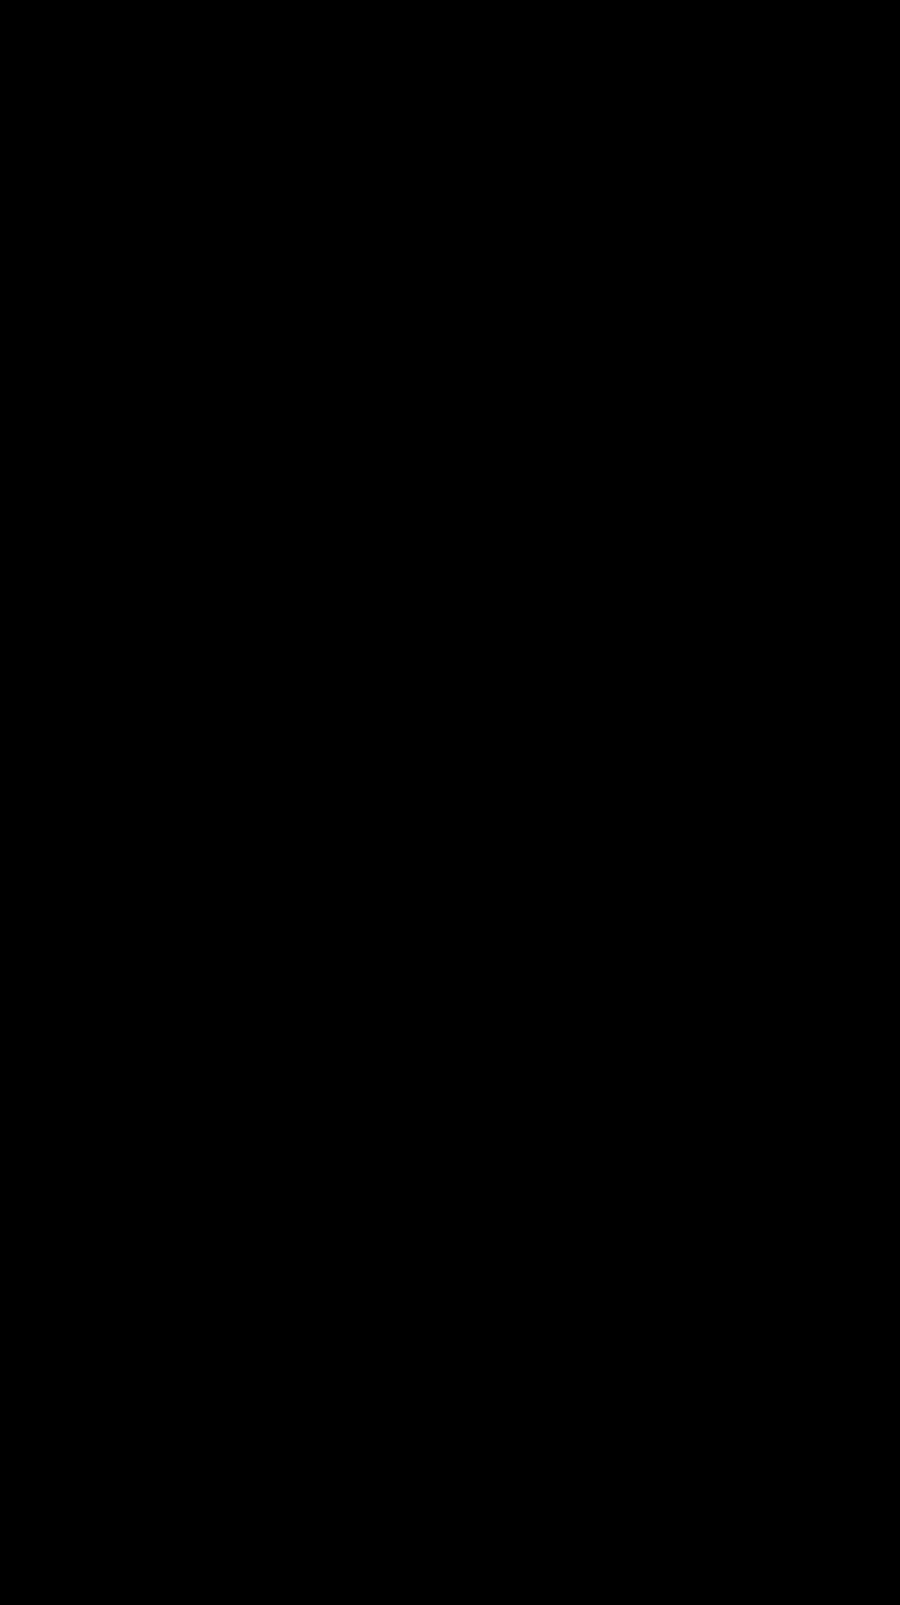 Neko Lineart : Neko cc lineart by yiny chan on deviantart